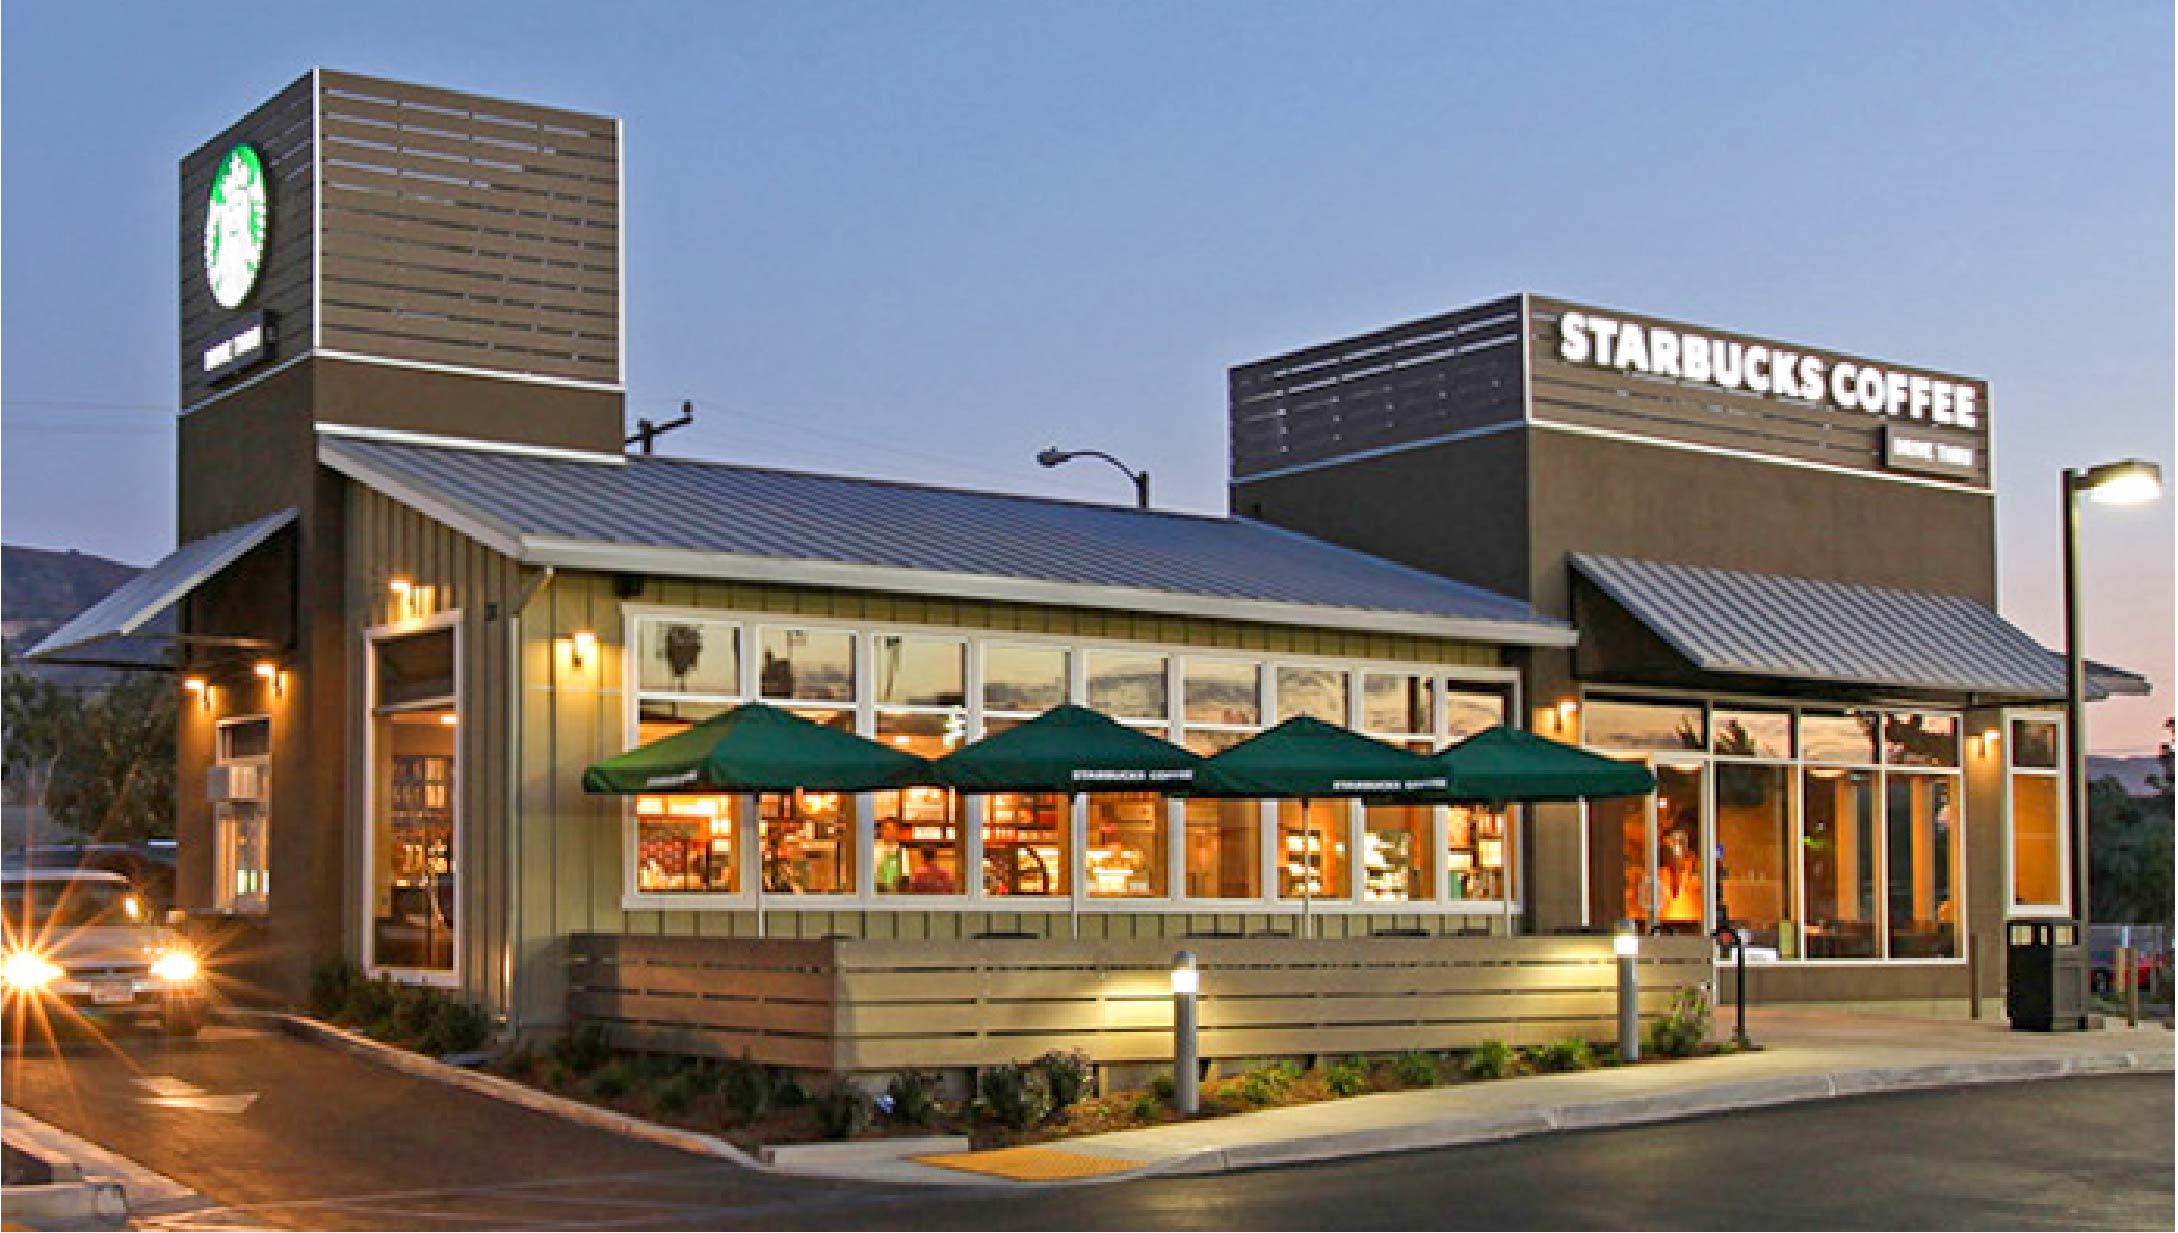 Starbucks Santa Paula